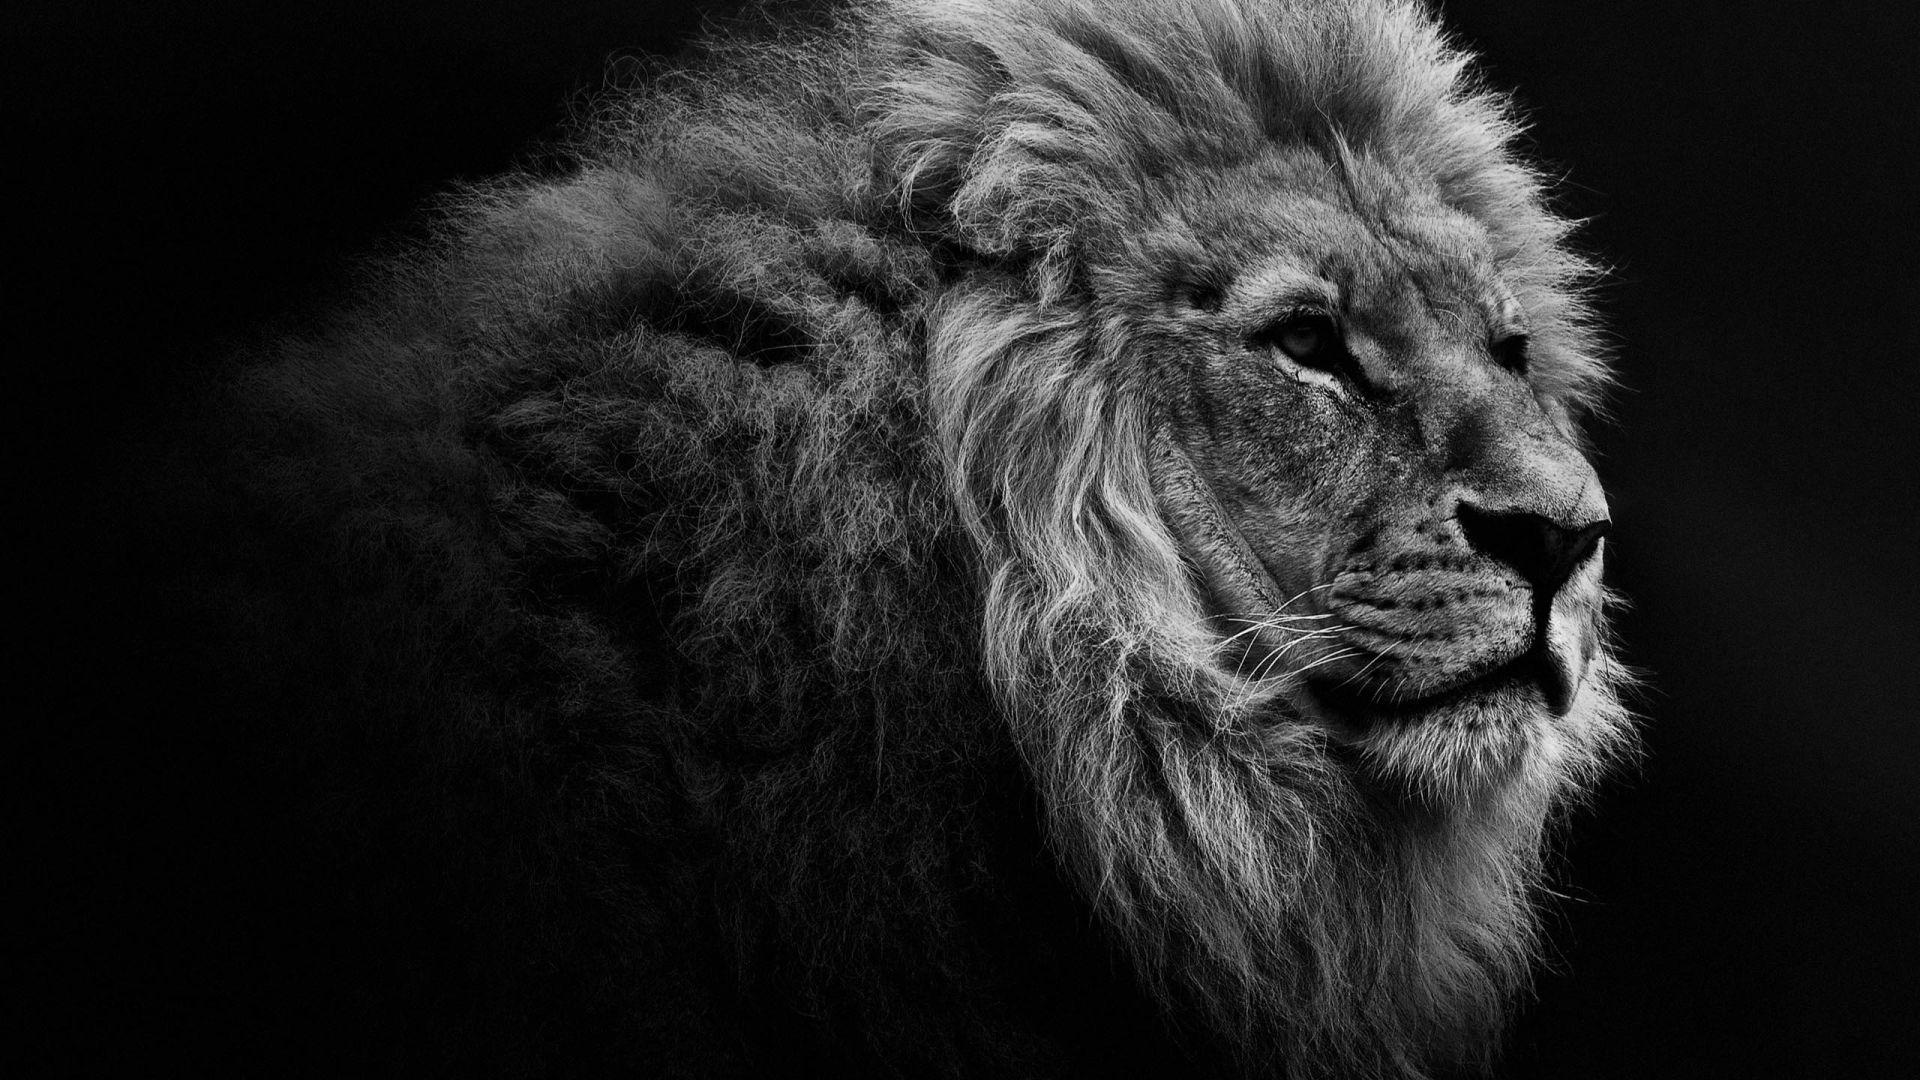 Desktop Hd Full Screen Lion Wallpapers - Wallpaper Cave